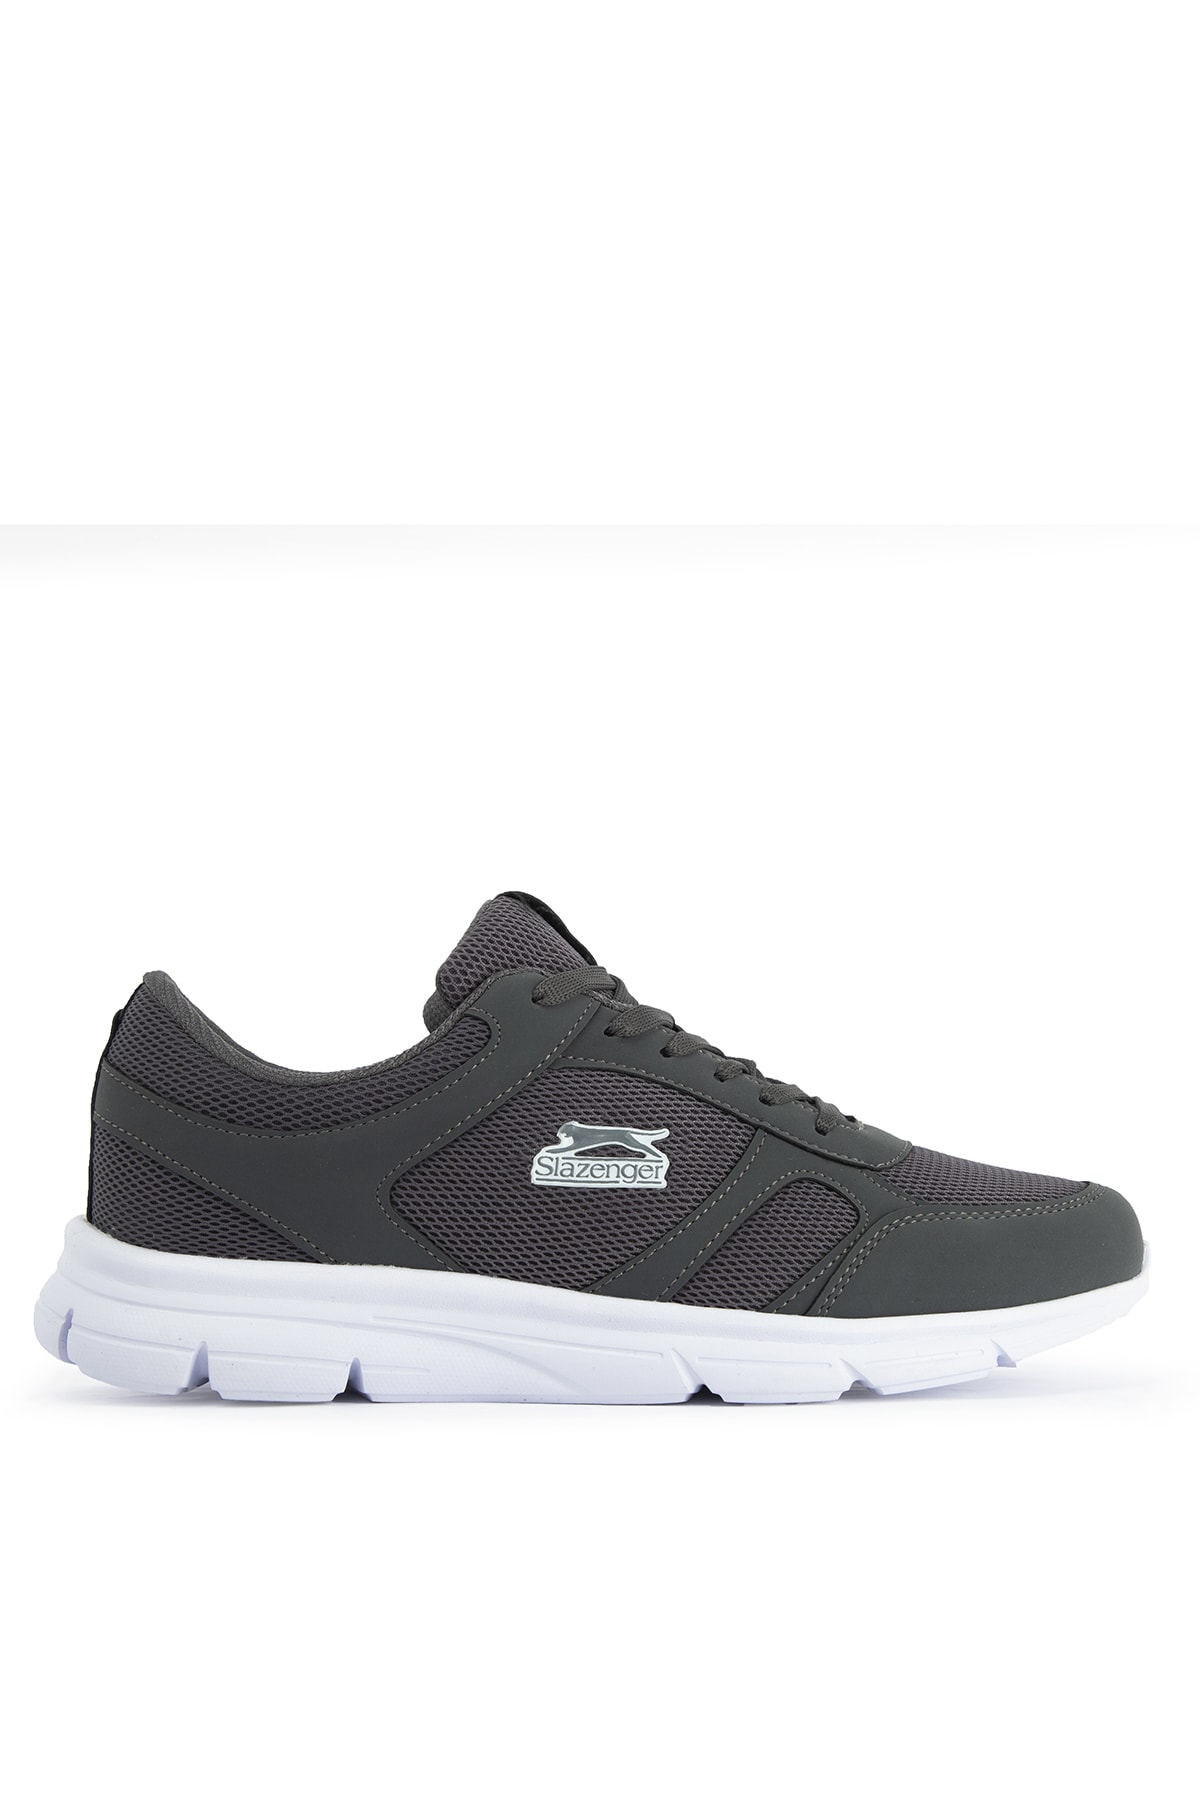 Escape I Sneaker Unisex Ayakkabı K.gri Sa11re230